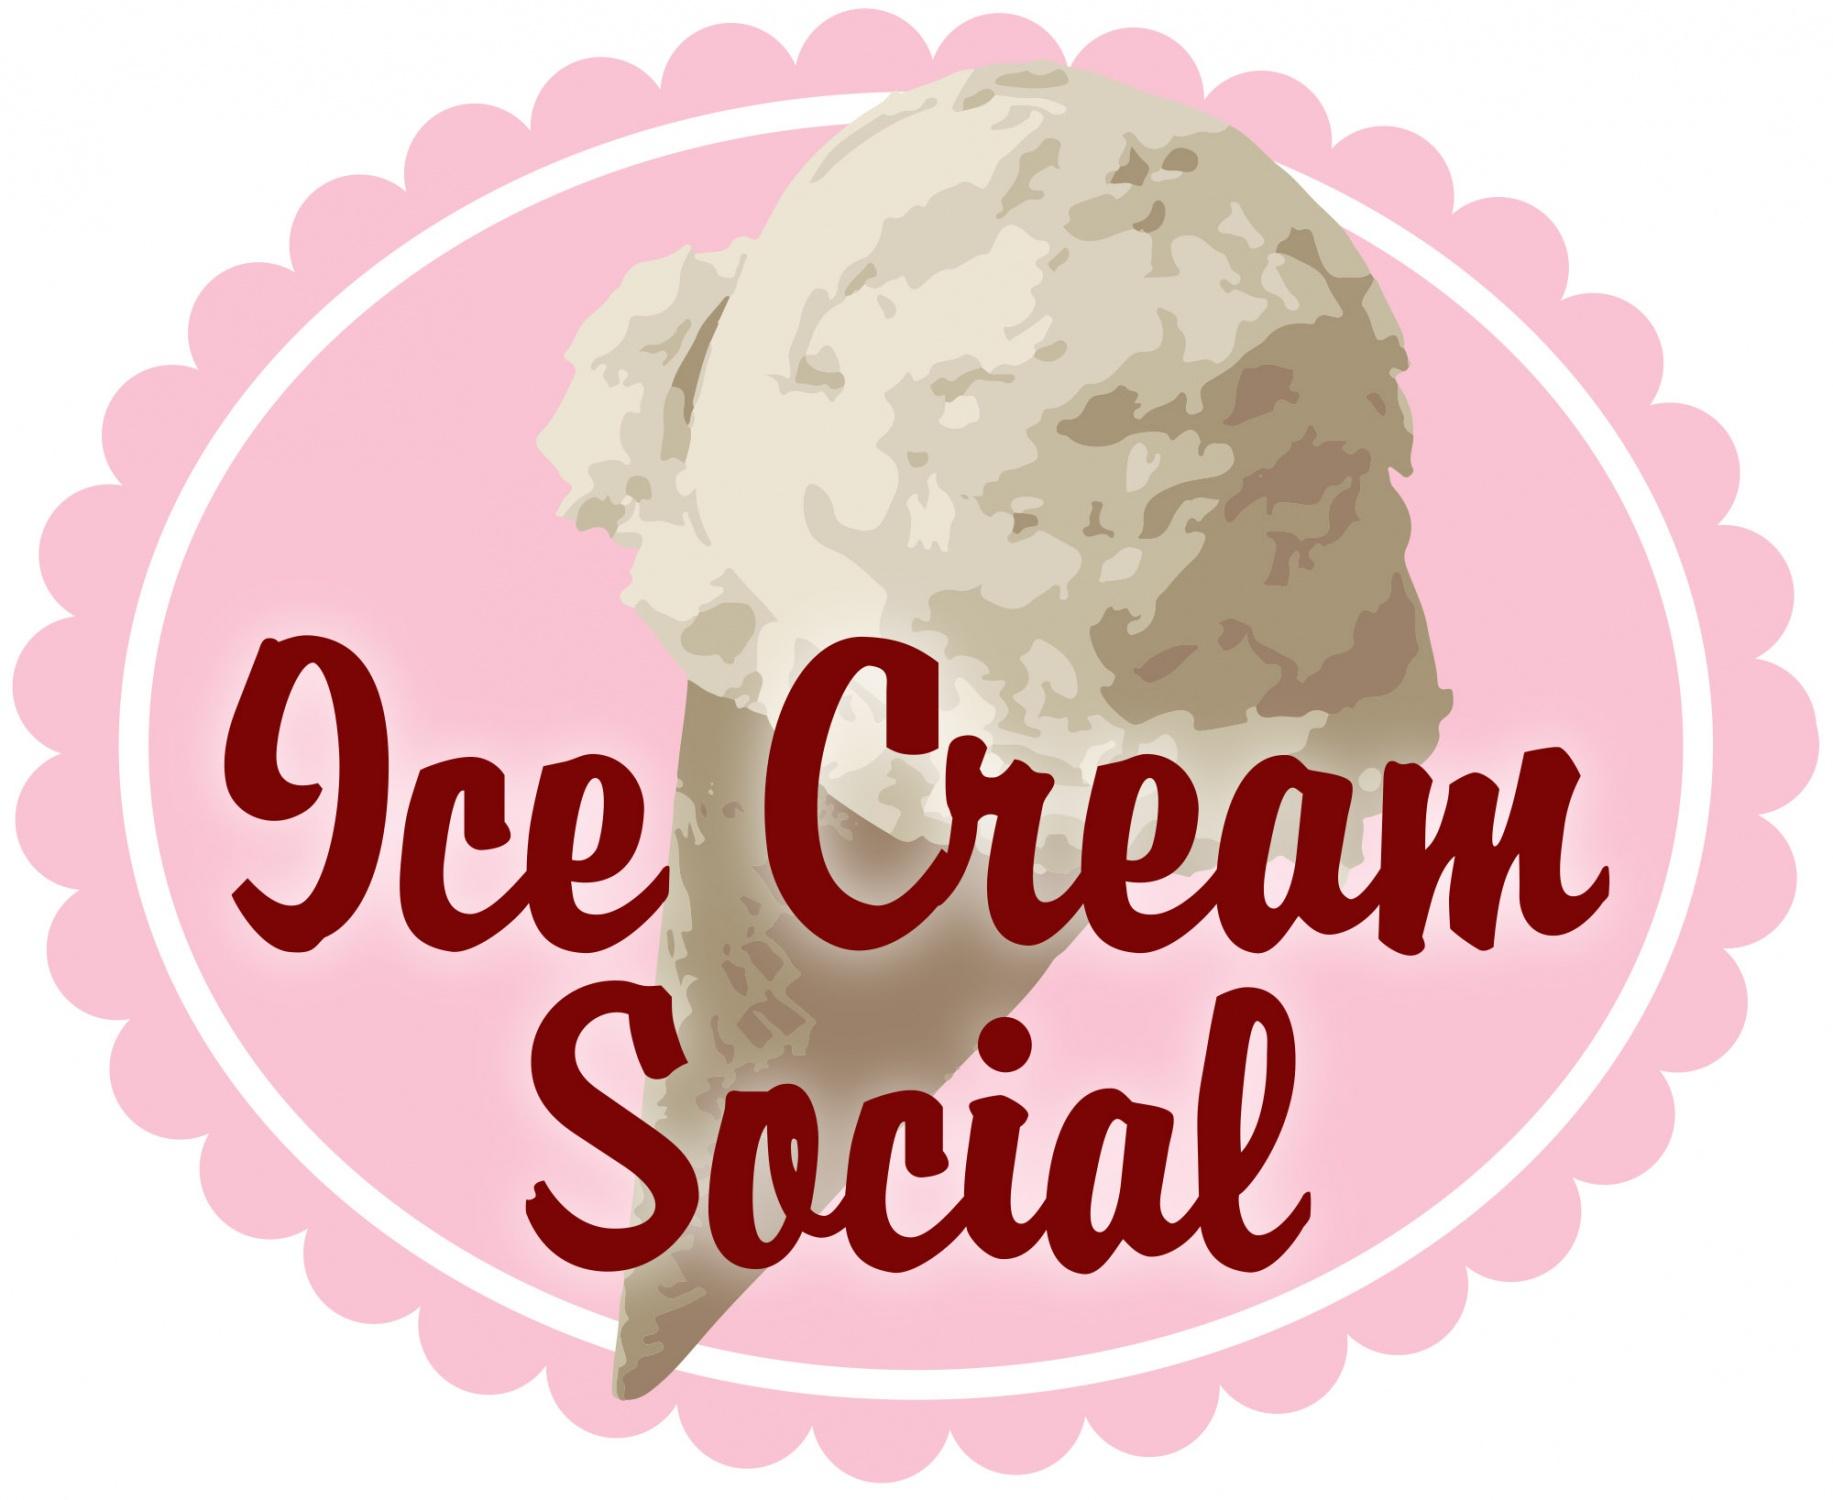 Ice cream social clipart free clip download Pre-K Ice Cream Social - August 31 @ 5pm - Greenport Union ... clip download